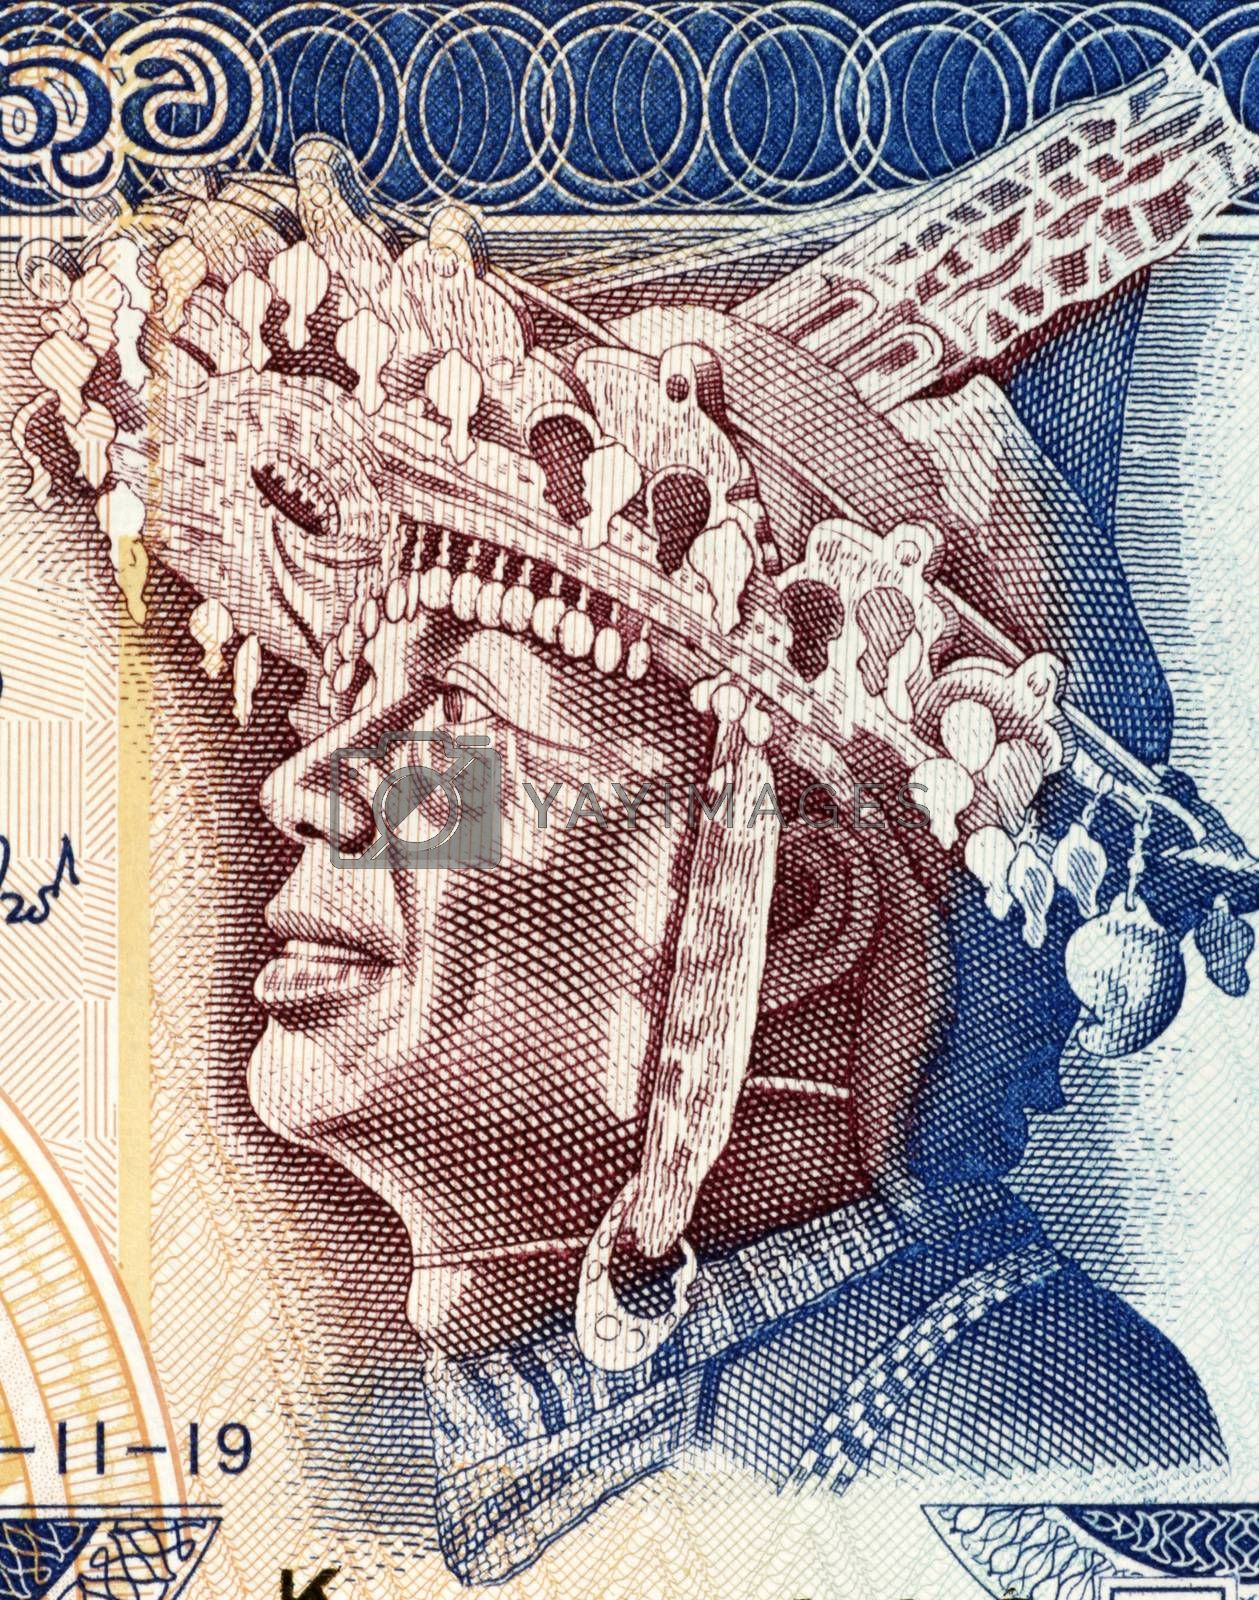 SriLankan Dancer with local Headdress by Georgios